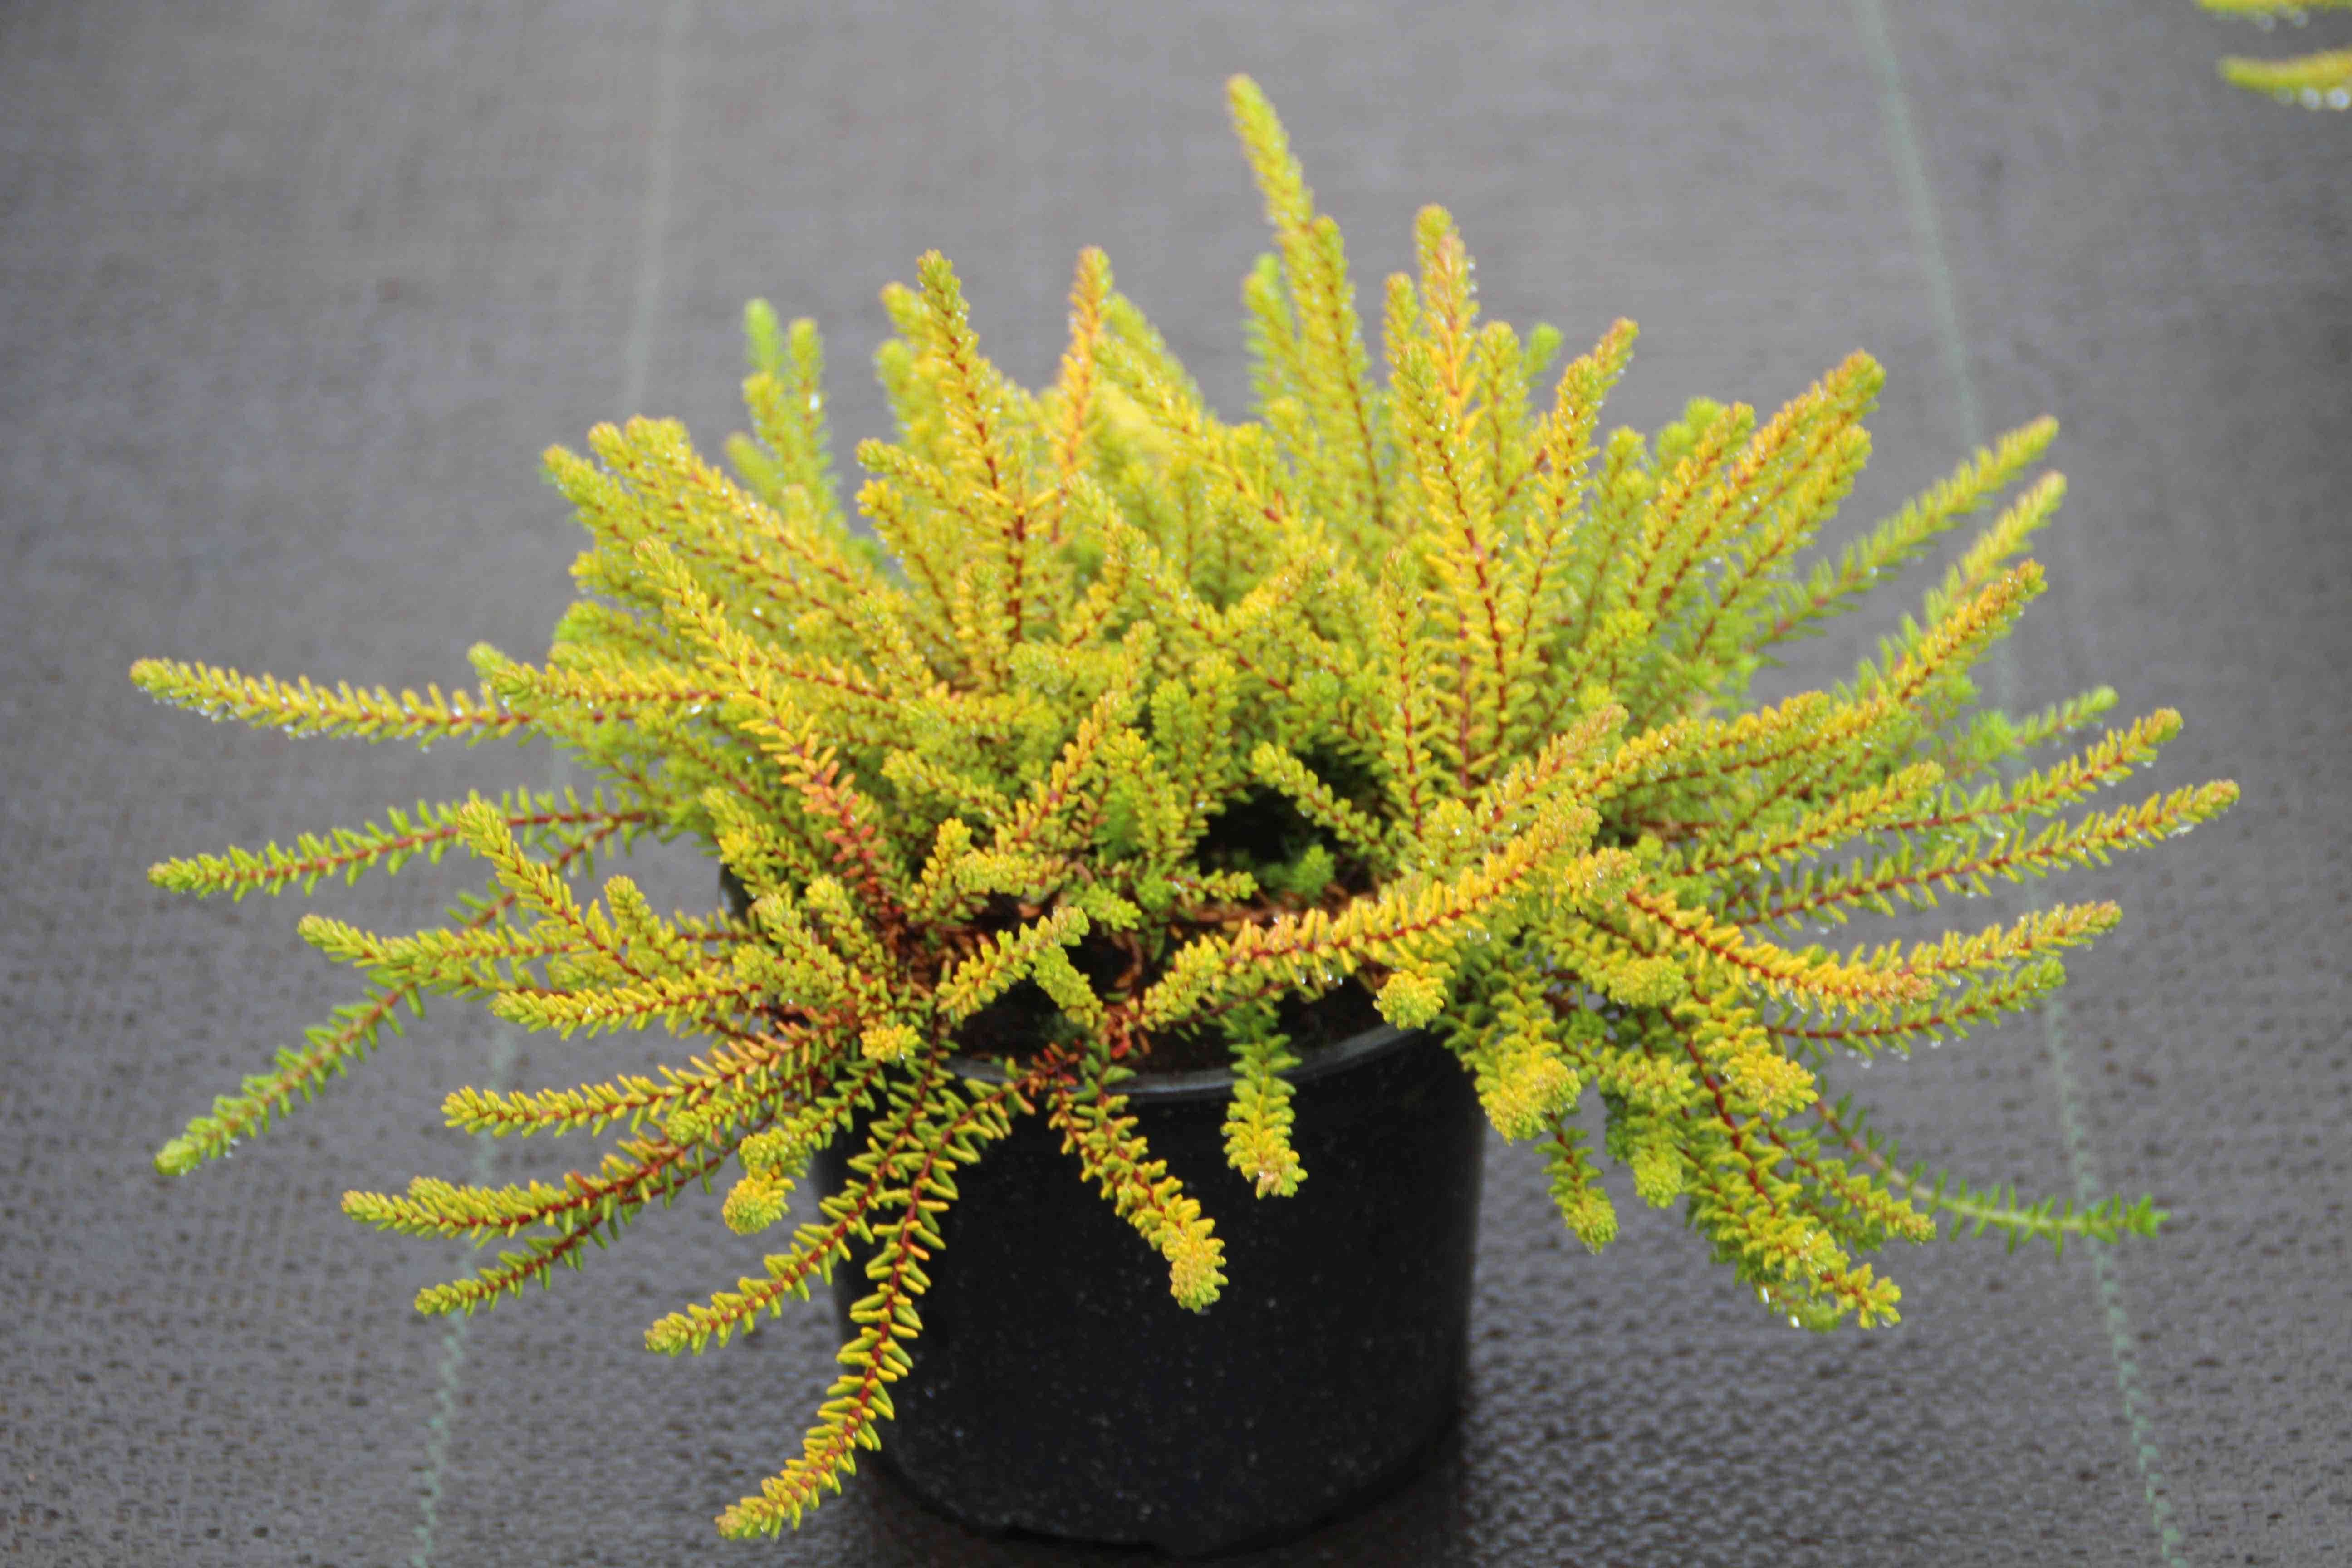 Kraaiheide geel (Empetrum nigrum 'Bernstein') 15/20 cm. Kleur: paars